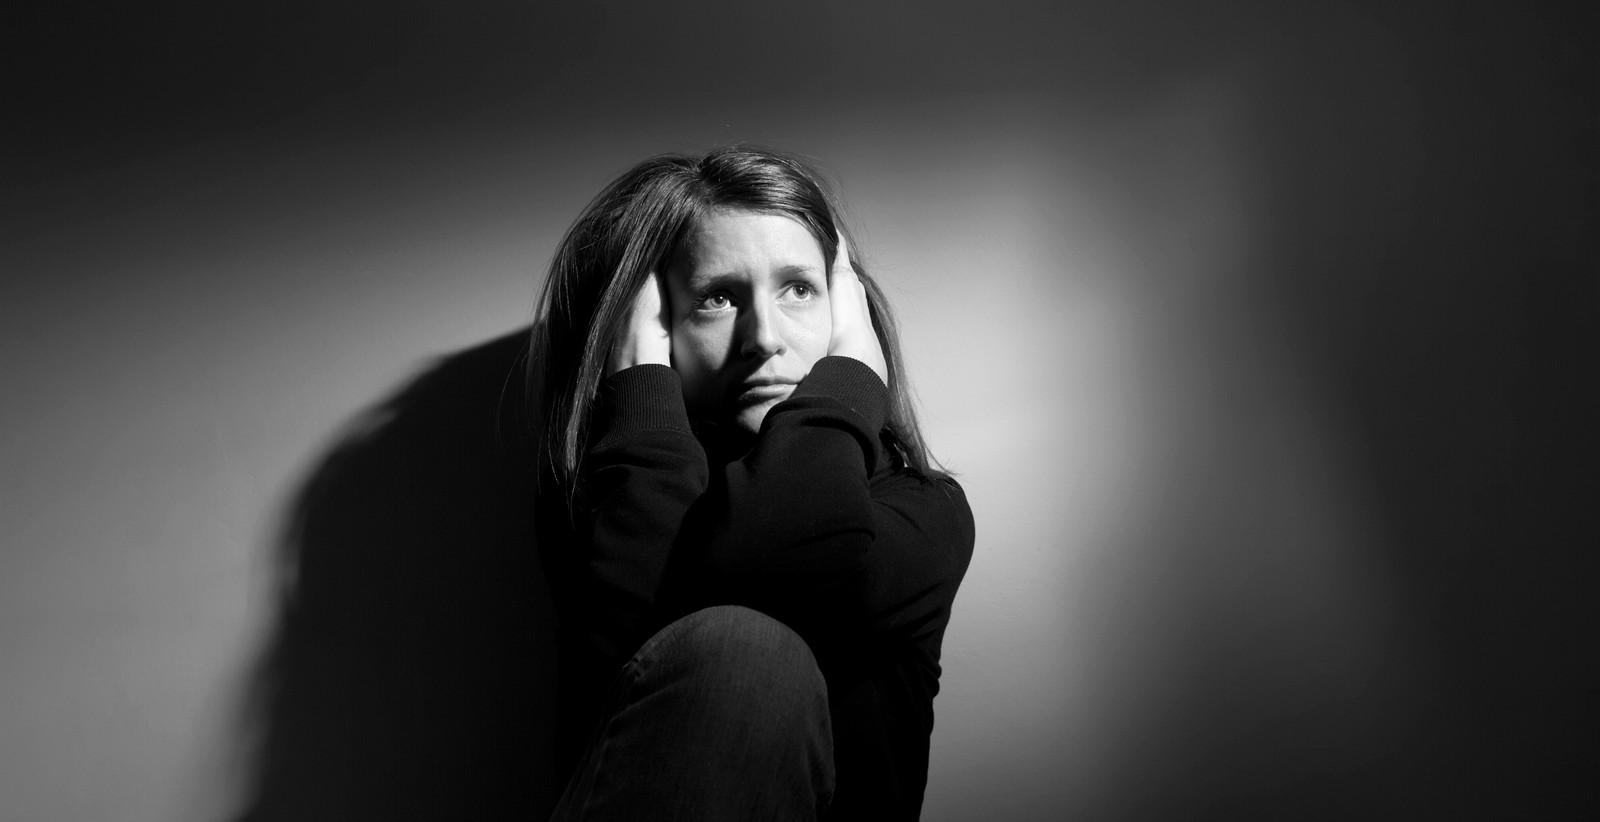 Redefining Depression and Medicalizing Sadness | Health